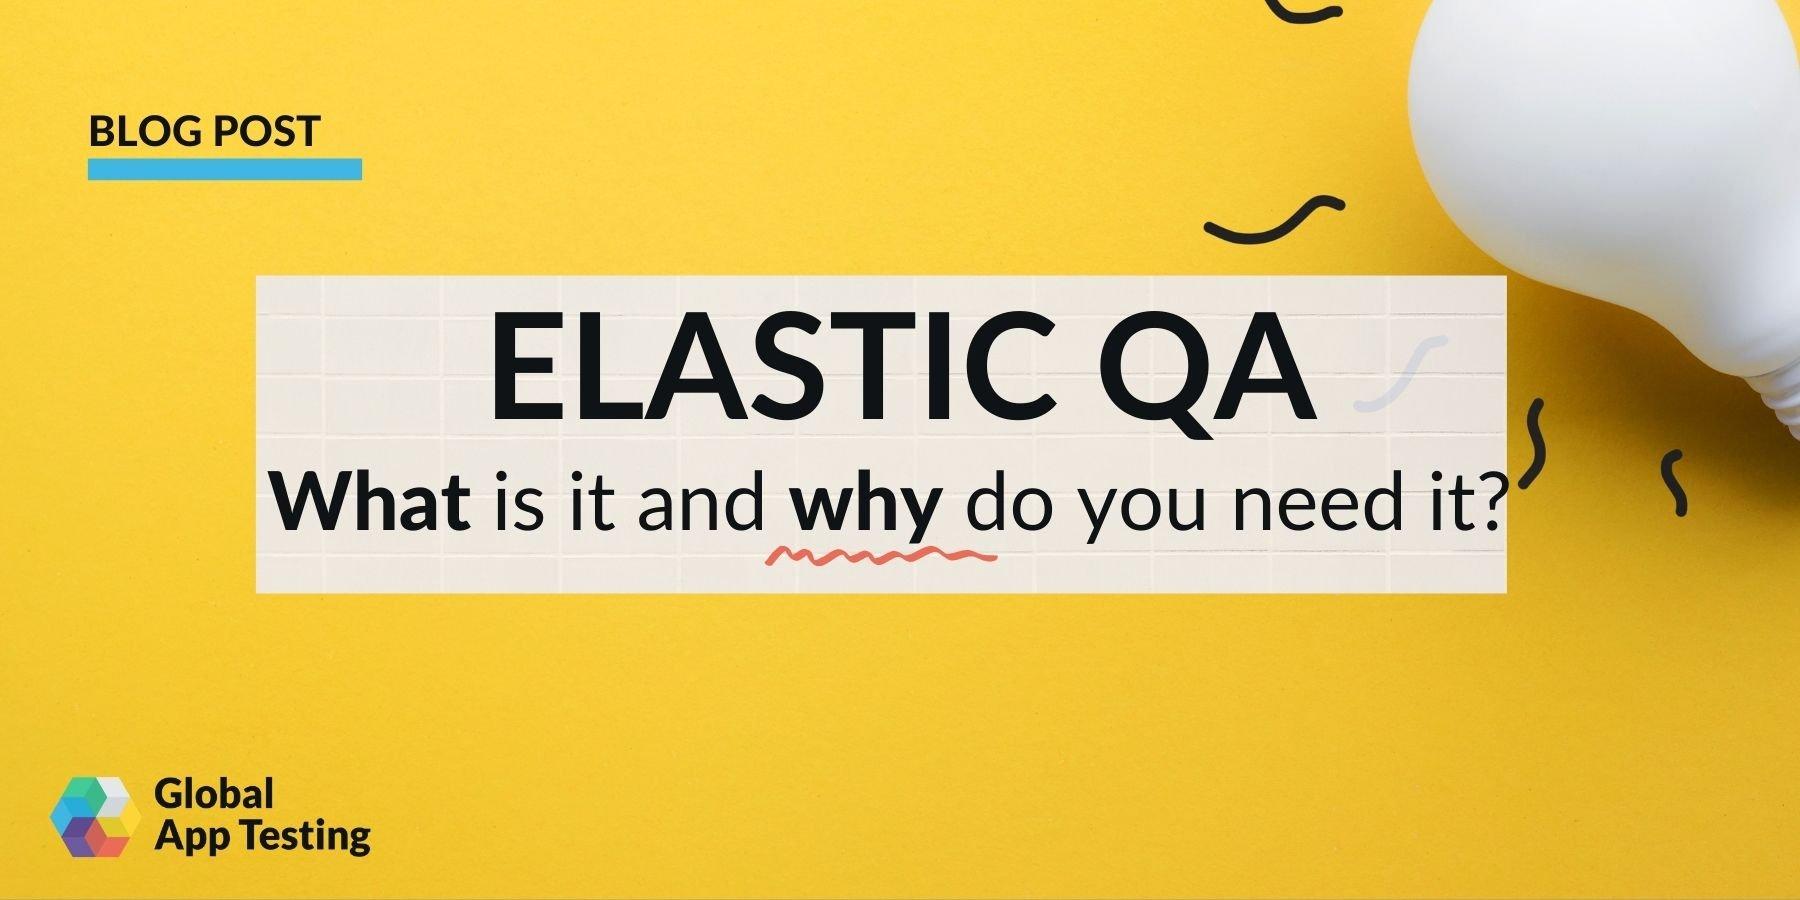 key takeaways from Elastic QA (1)